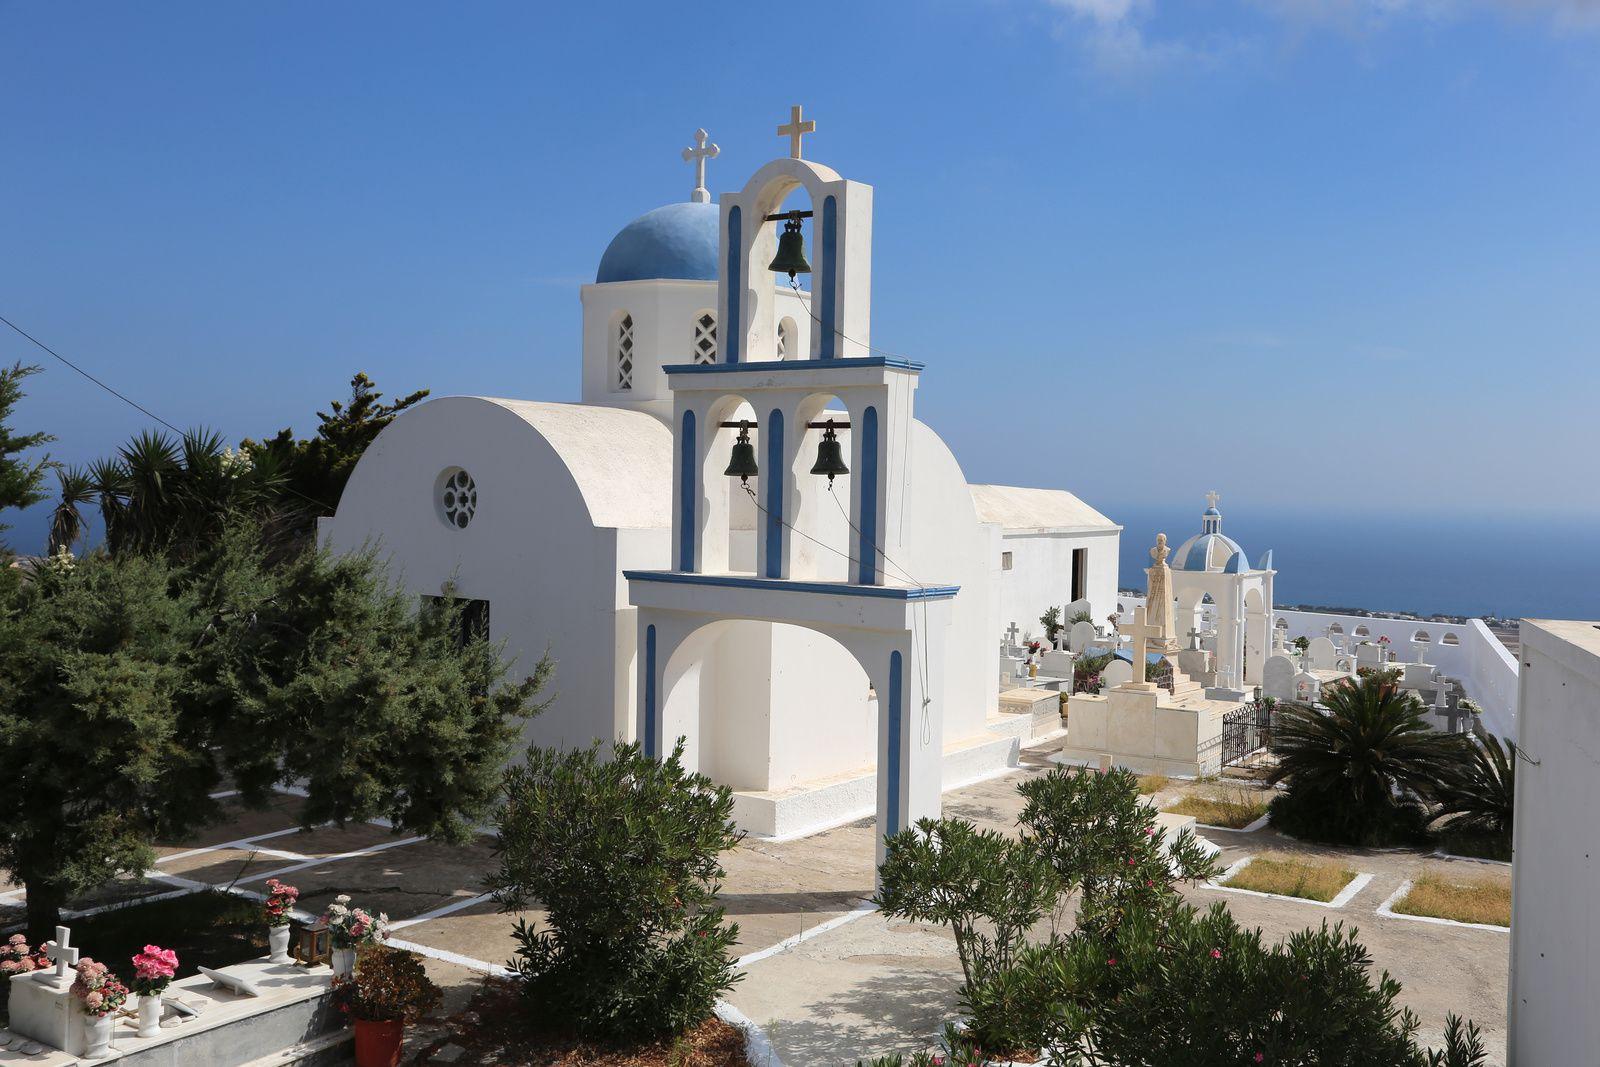 Santorin - Pyrgos - église et son cimetière, surplombants la caldeira - photo © Bernard Duyck 09.2019